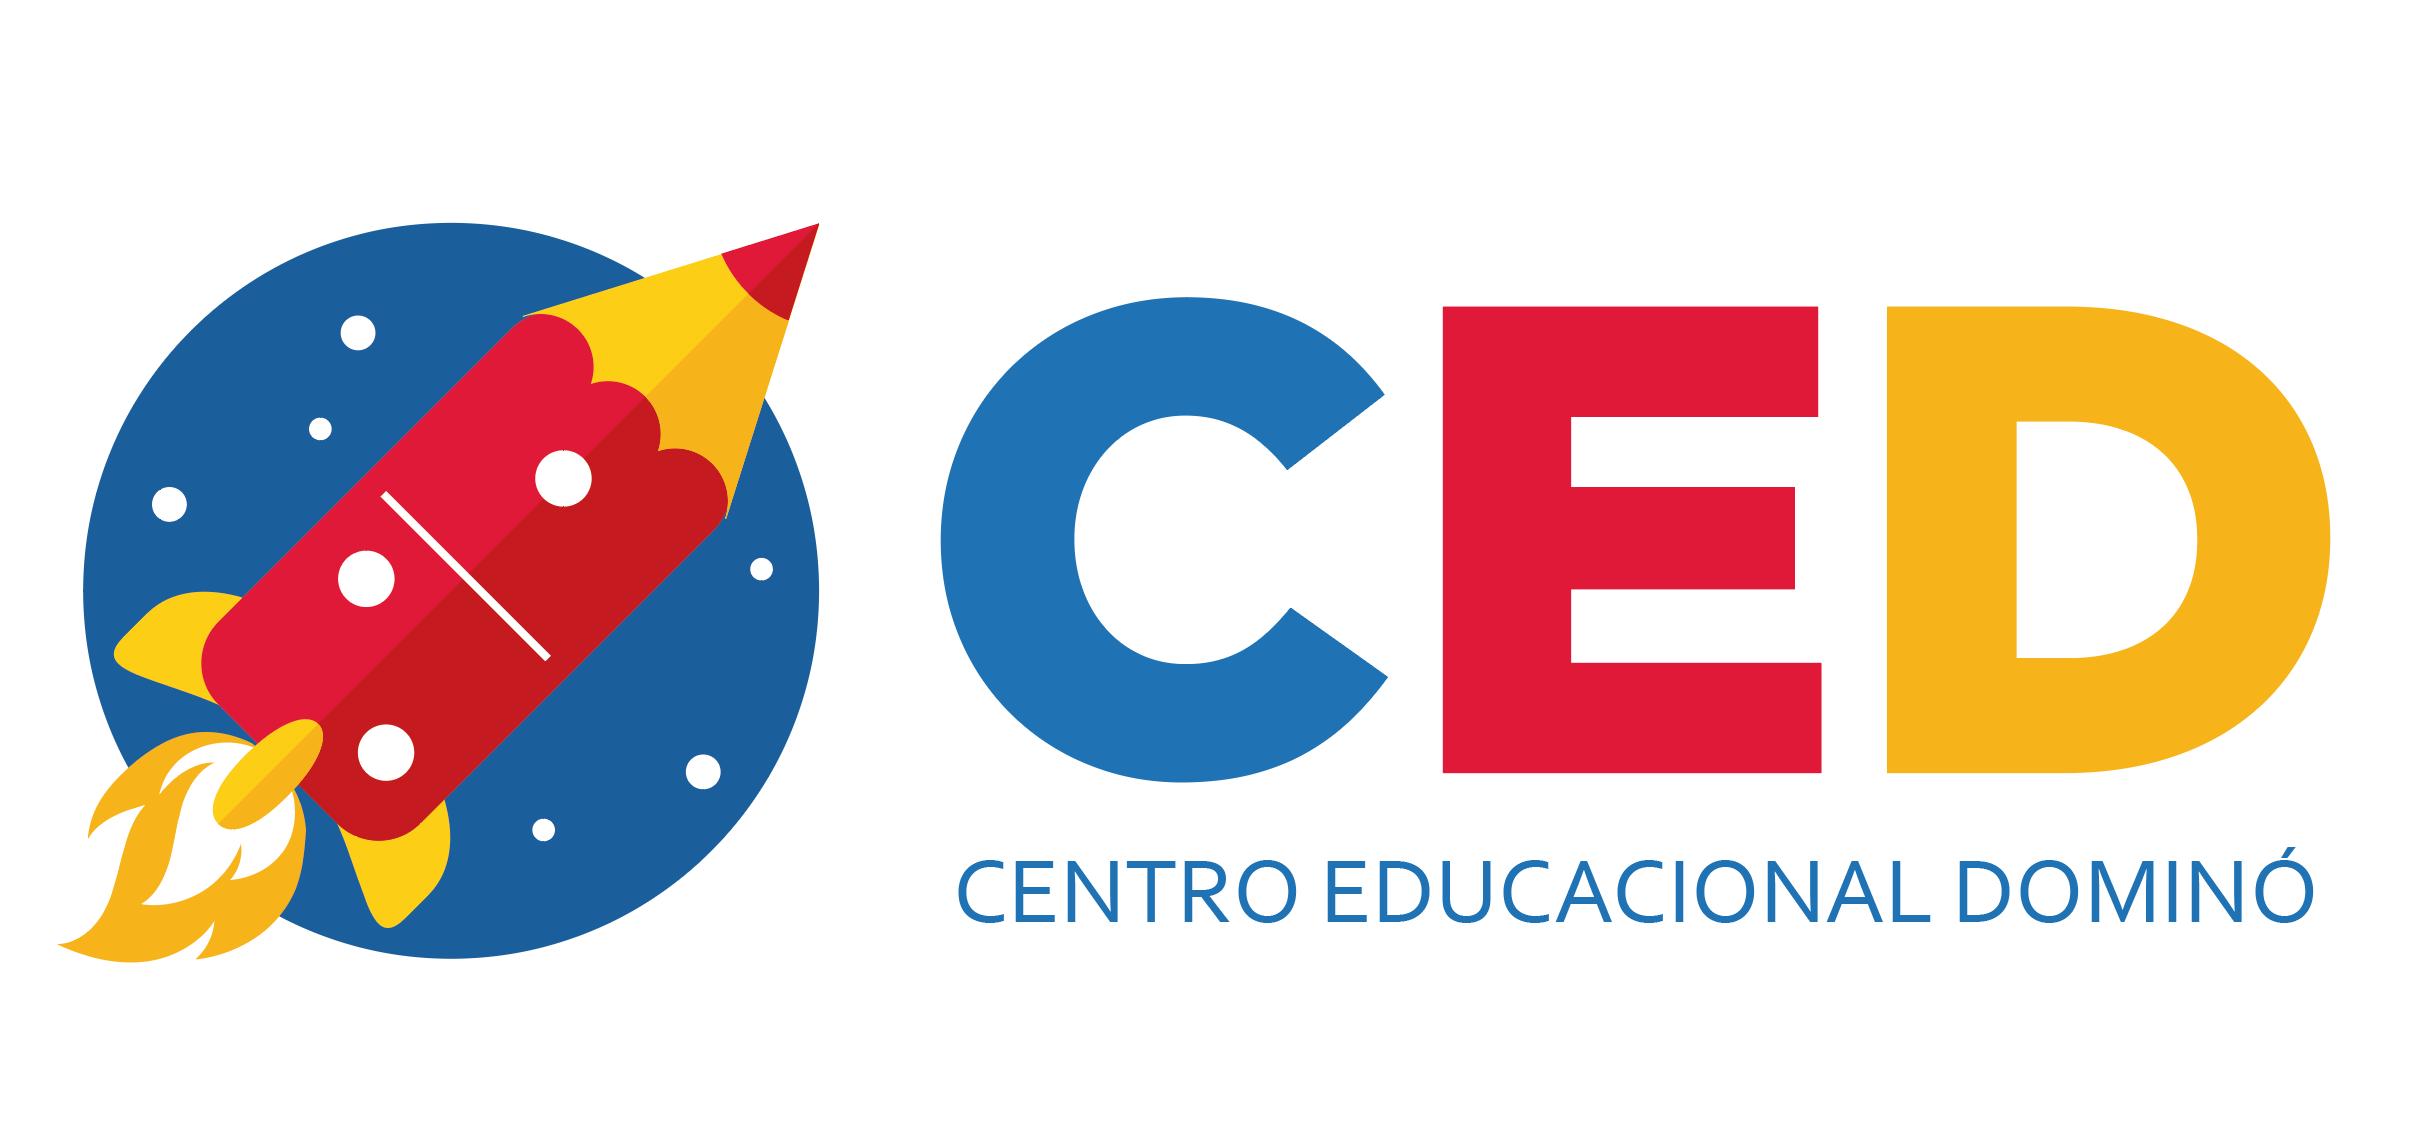 Centro Educacional Dominó